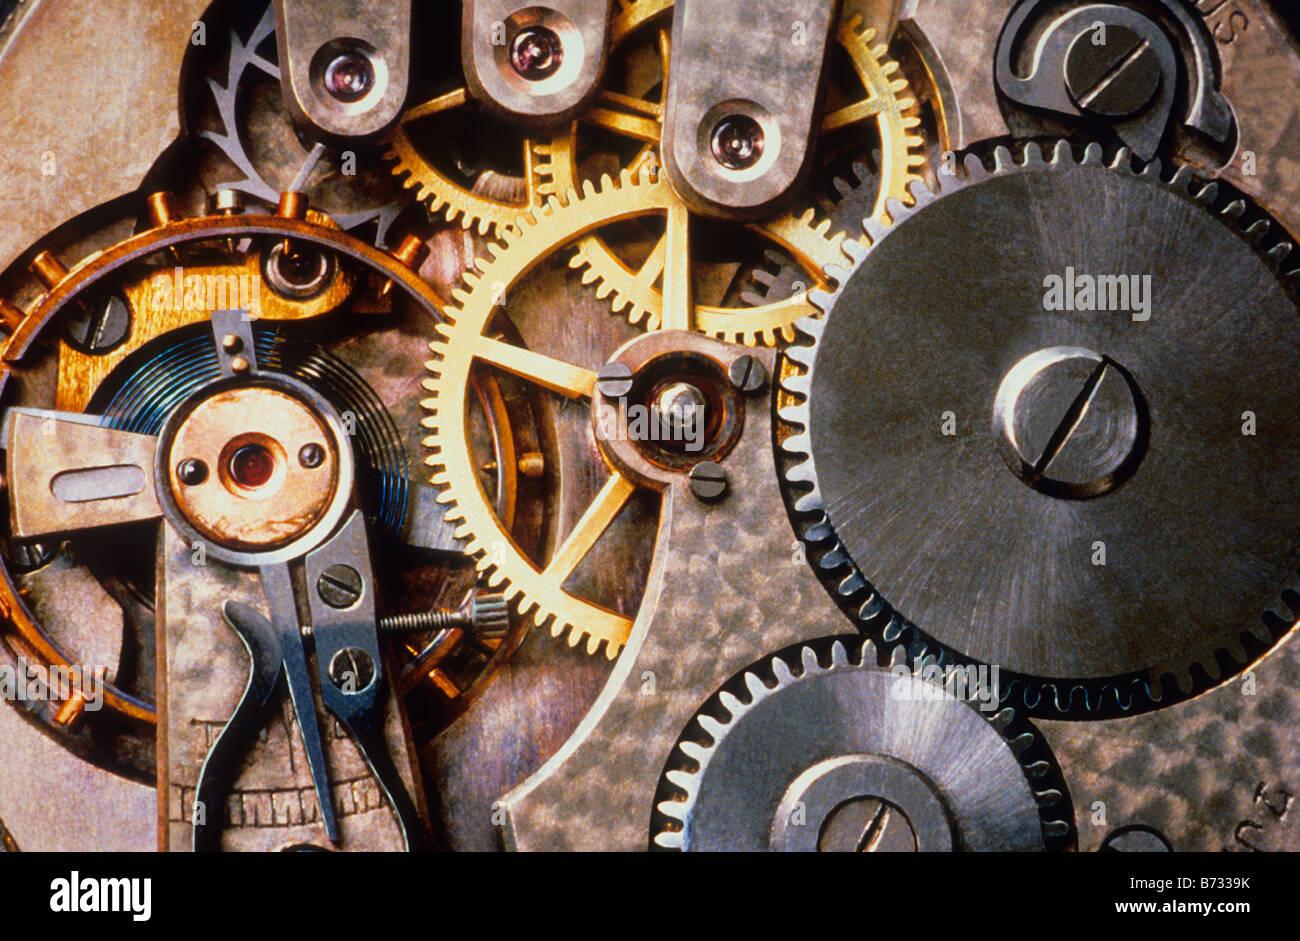 Clock Interior Watch Gears Close up Sandra Baker - Stock Image